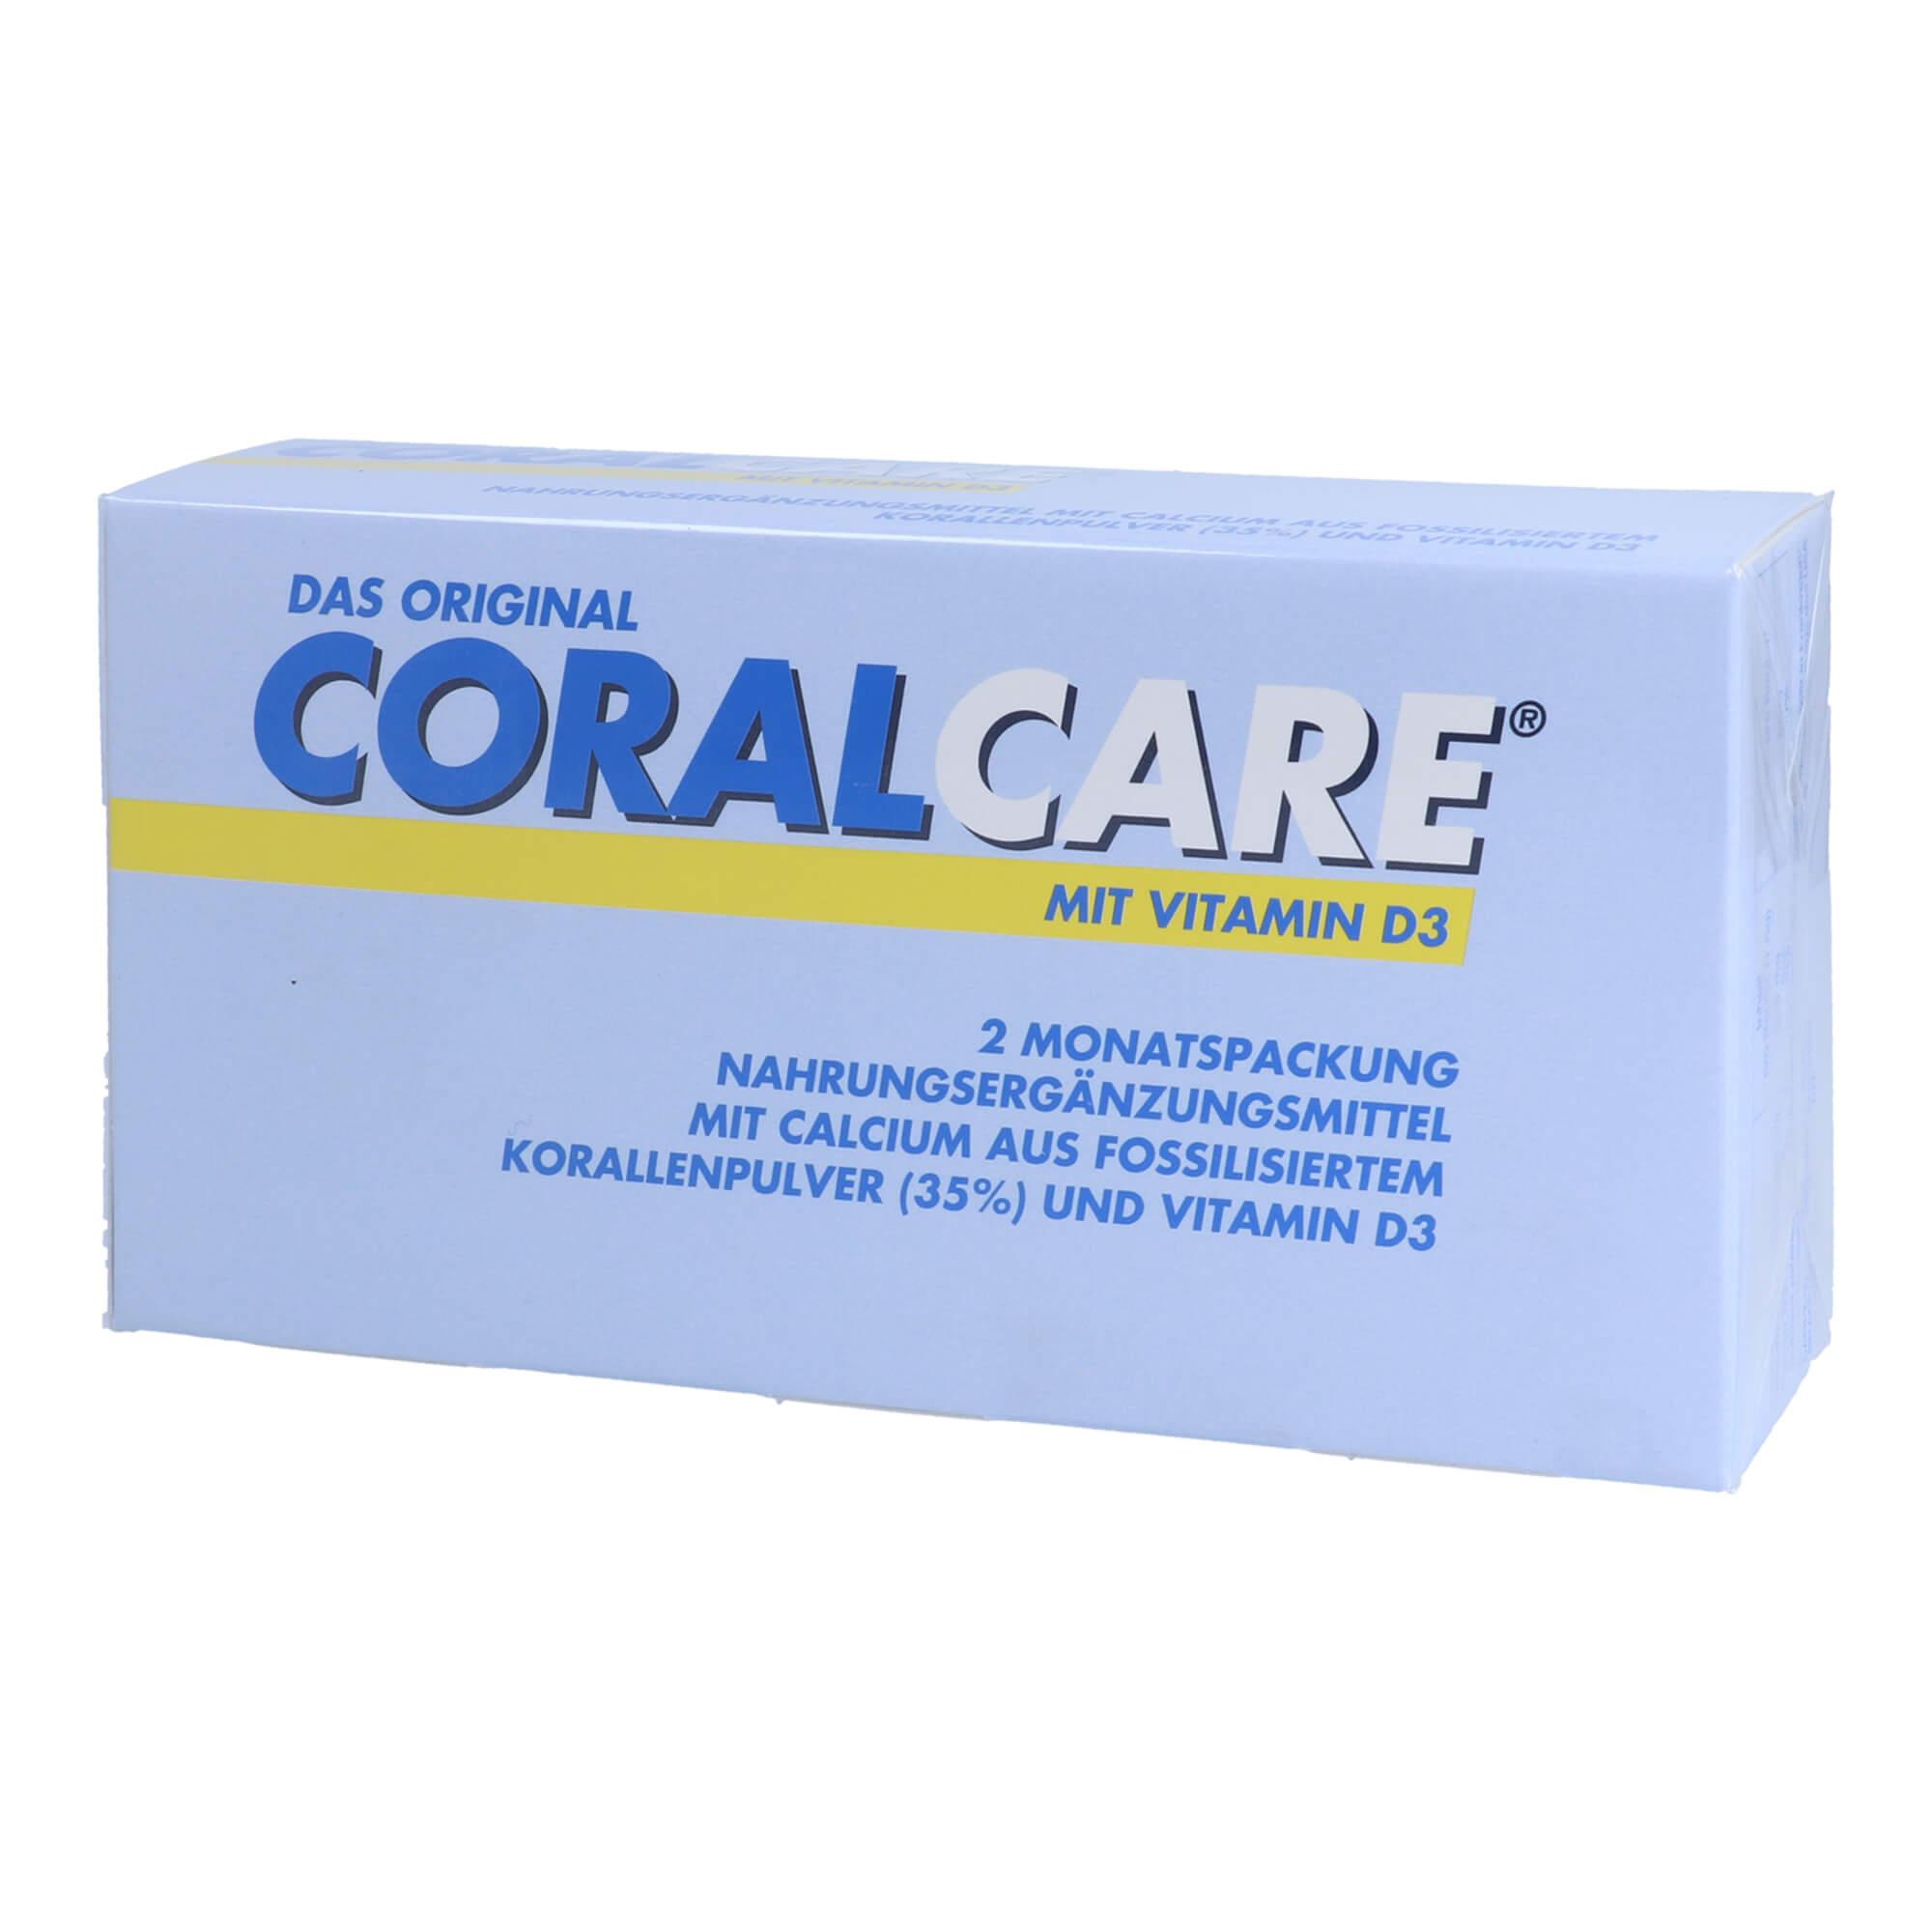 CoralCare 2-Monatspackung